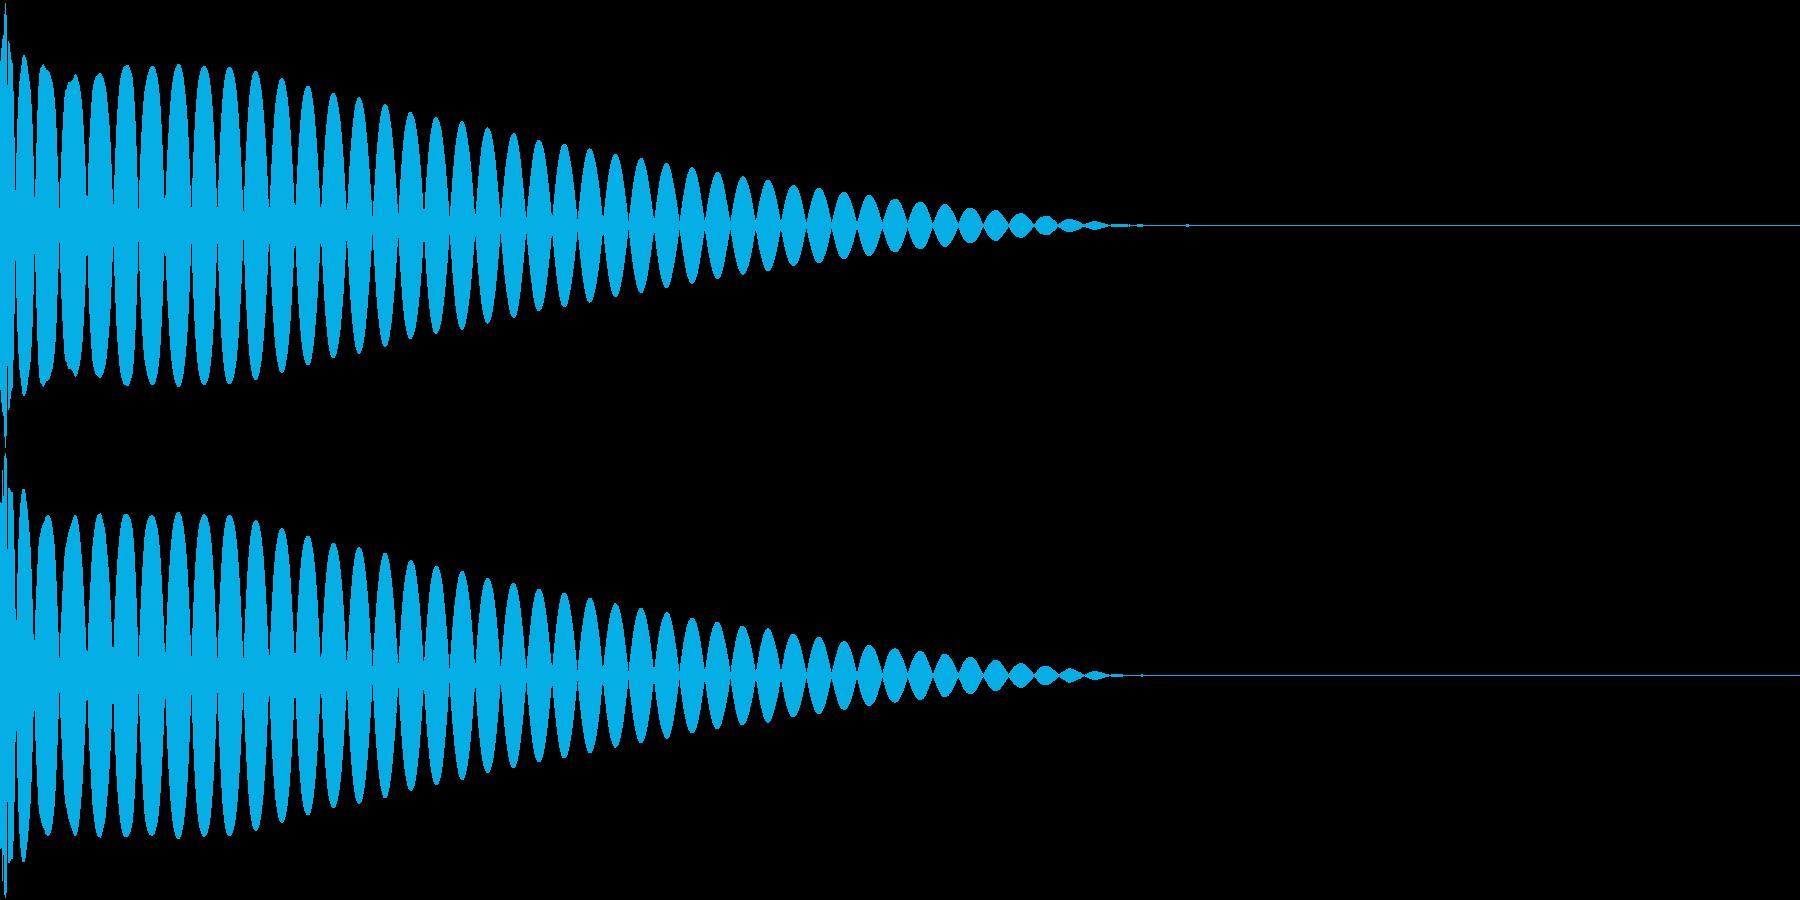 DTM Kick 4 オリジナル音源の再生済みの波形